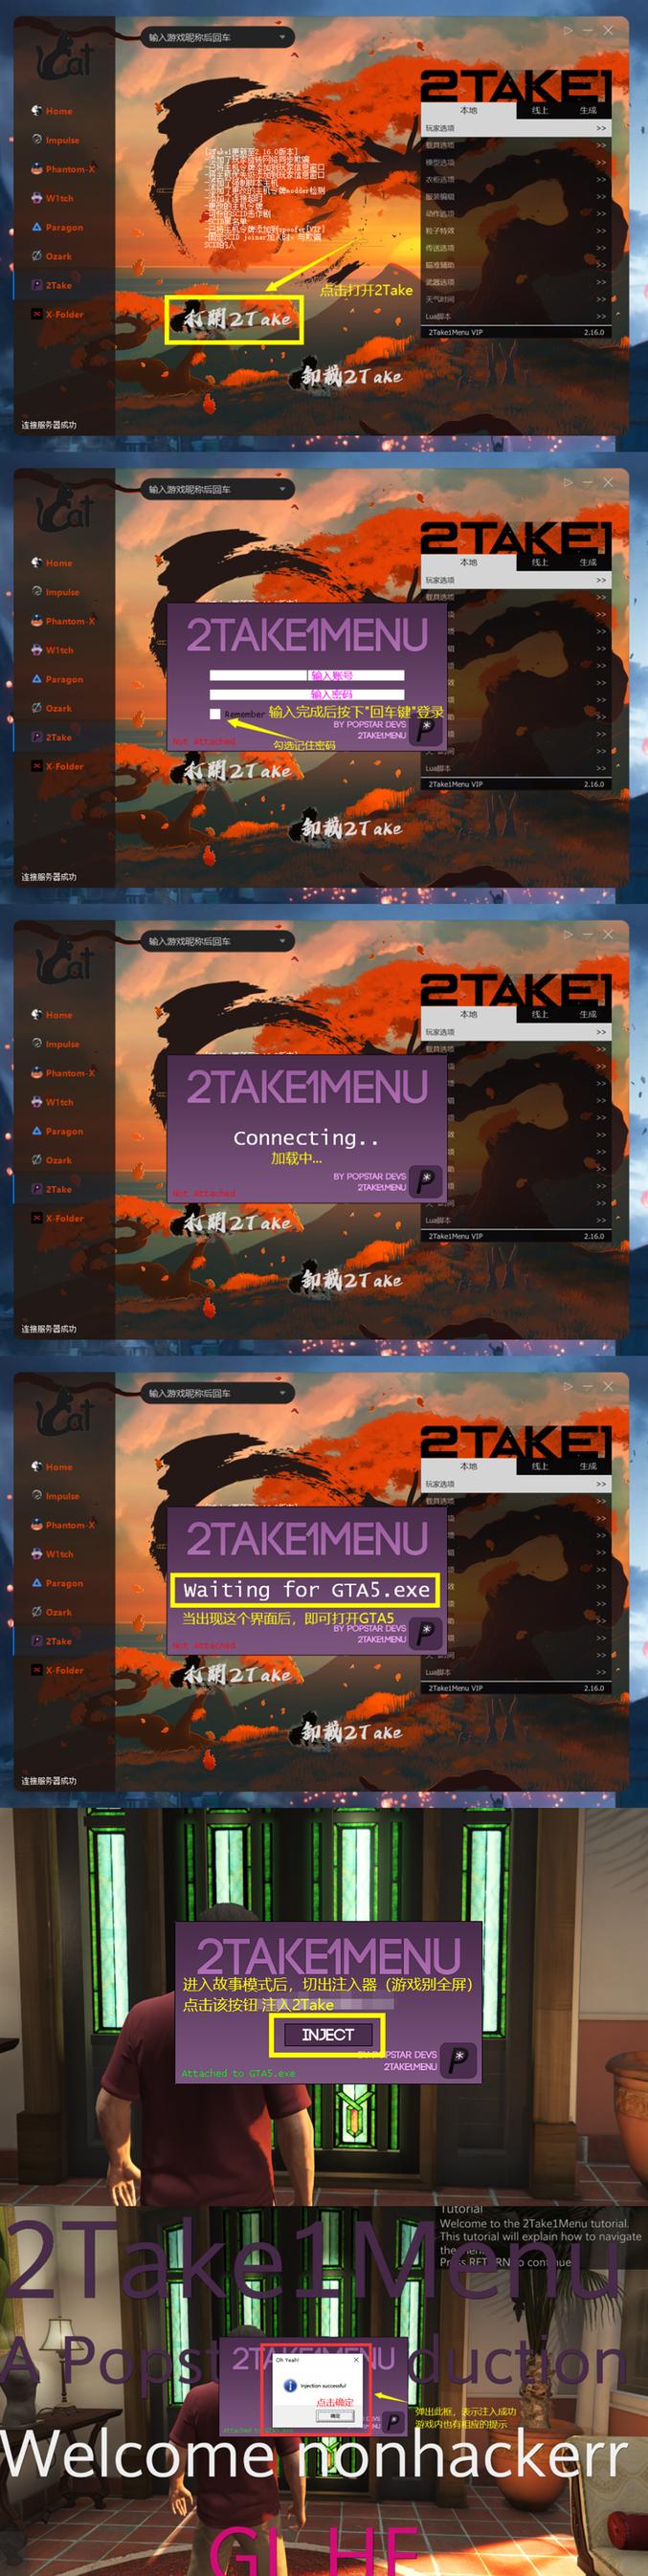 【2Take1】安装注入